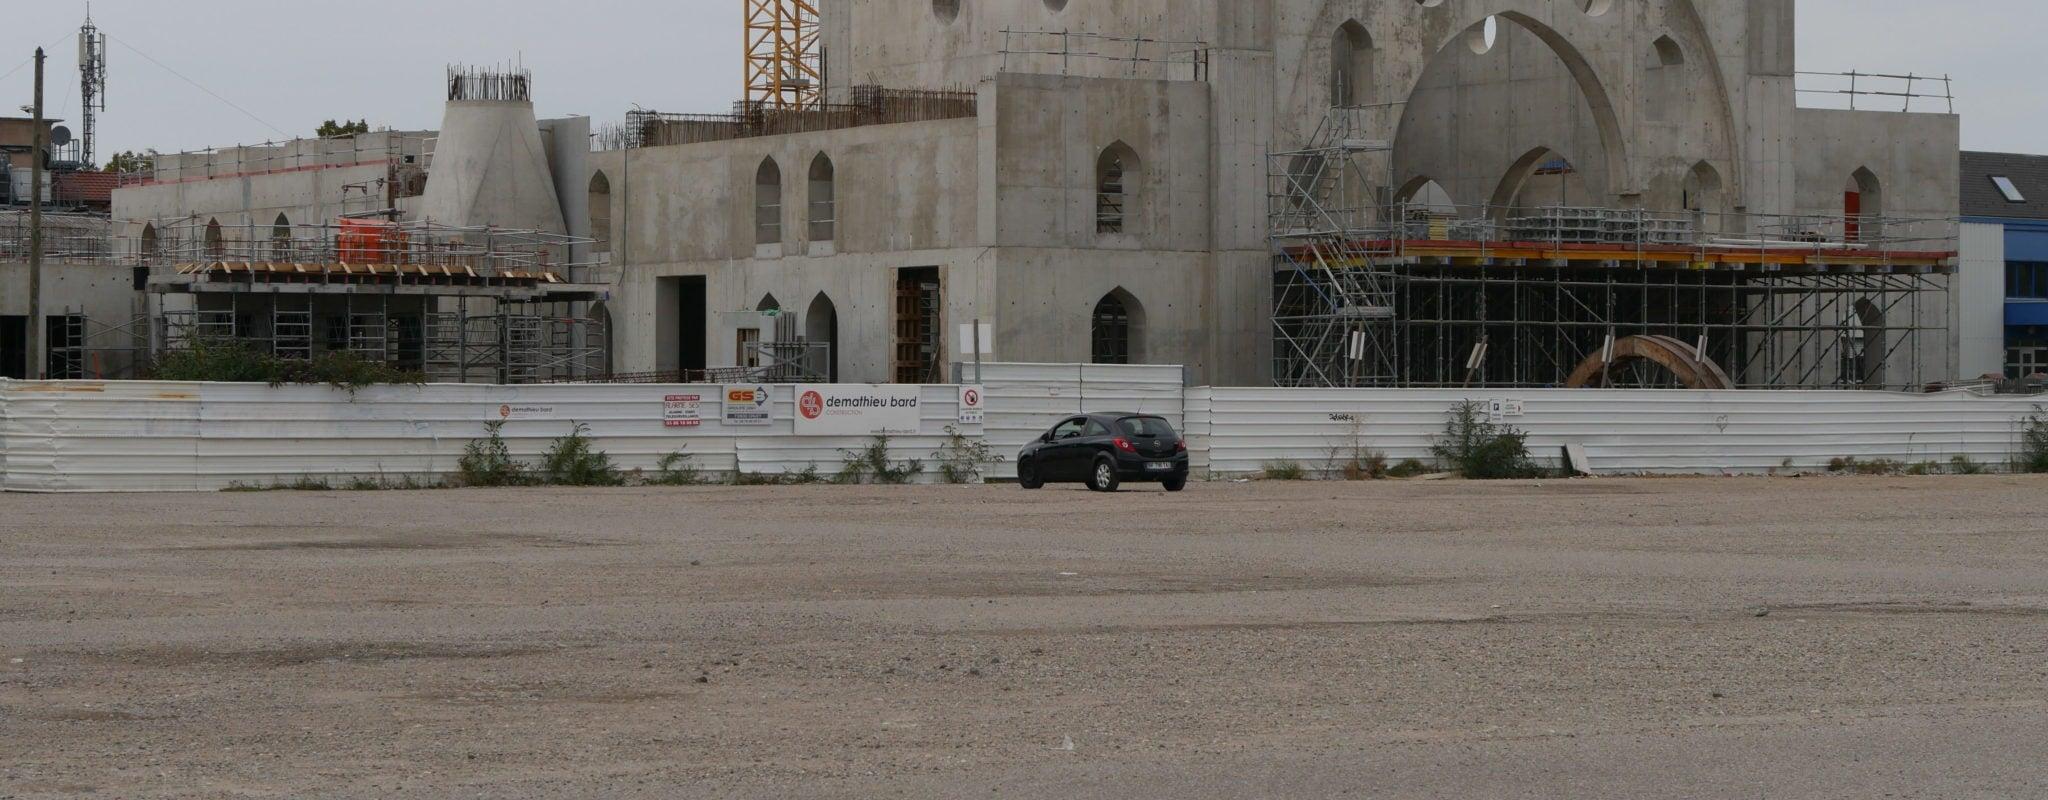 Pratiques mafieuses à Eyyub Sultan, la réponse d'Eyup Sahin et Lokman Arslan